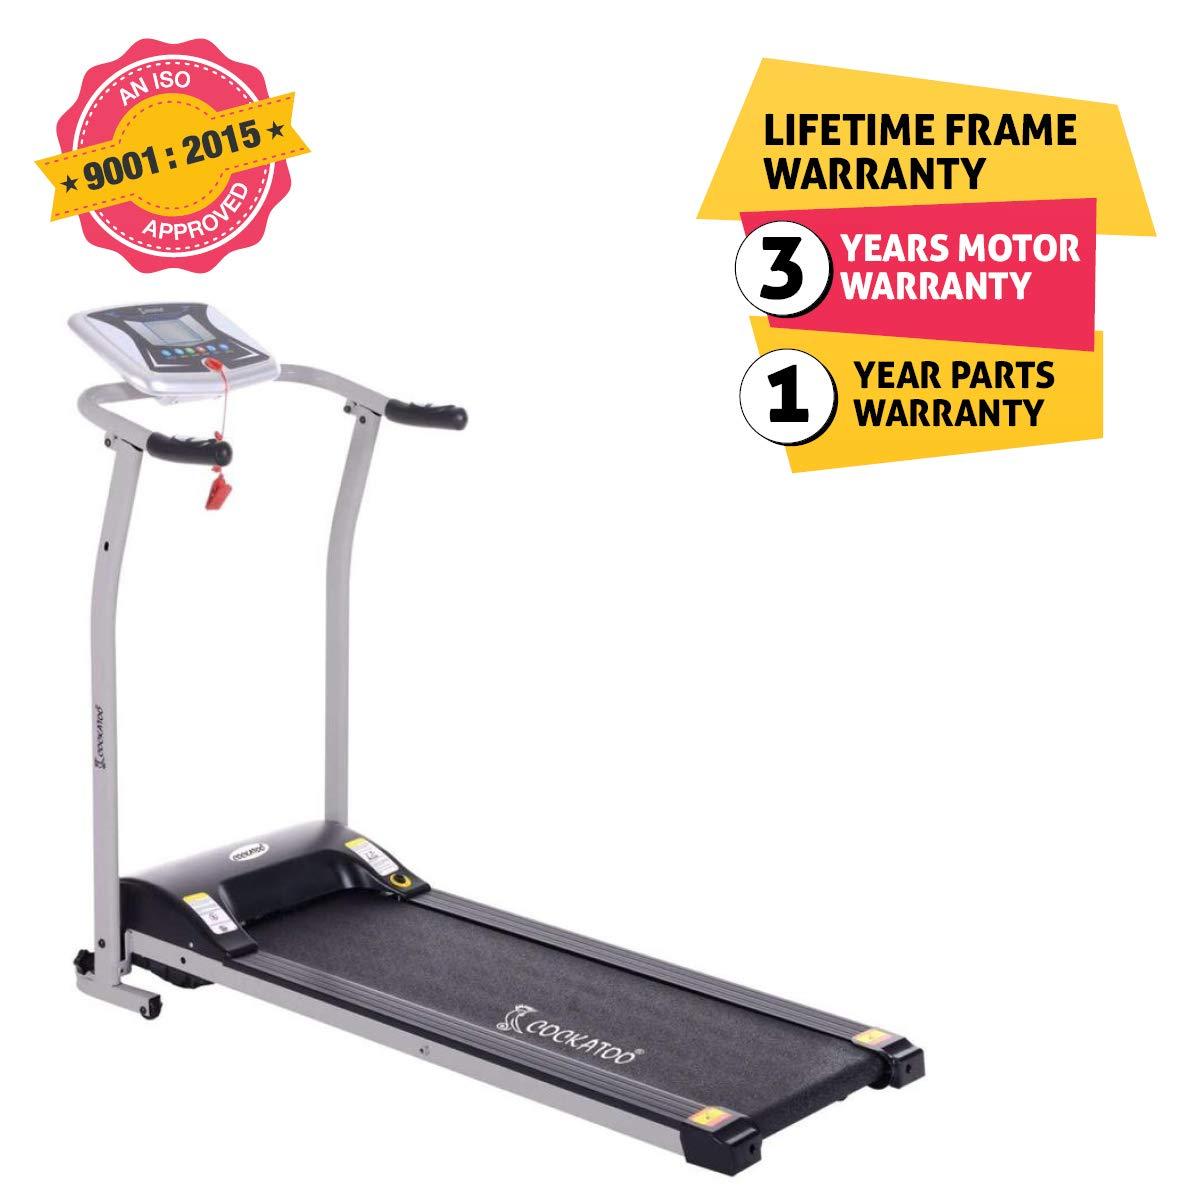 Cockatoo CTM08 Series Motorized Treadmill (1.5-2HP), Free